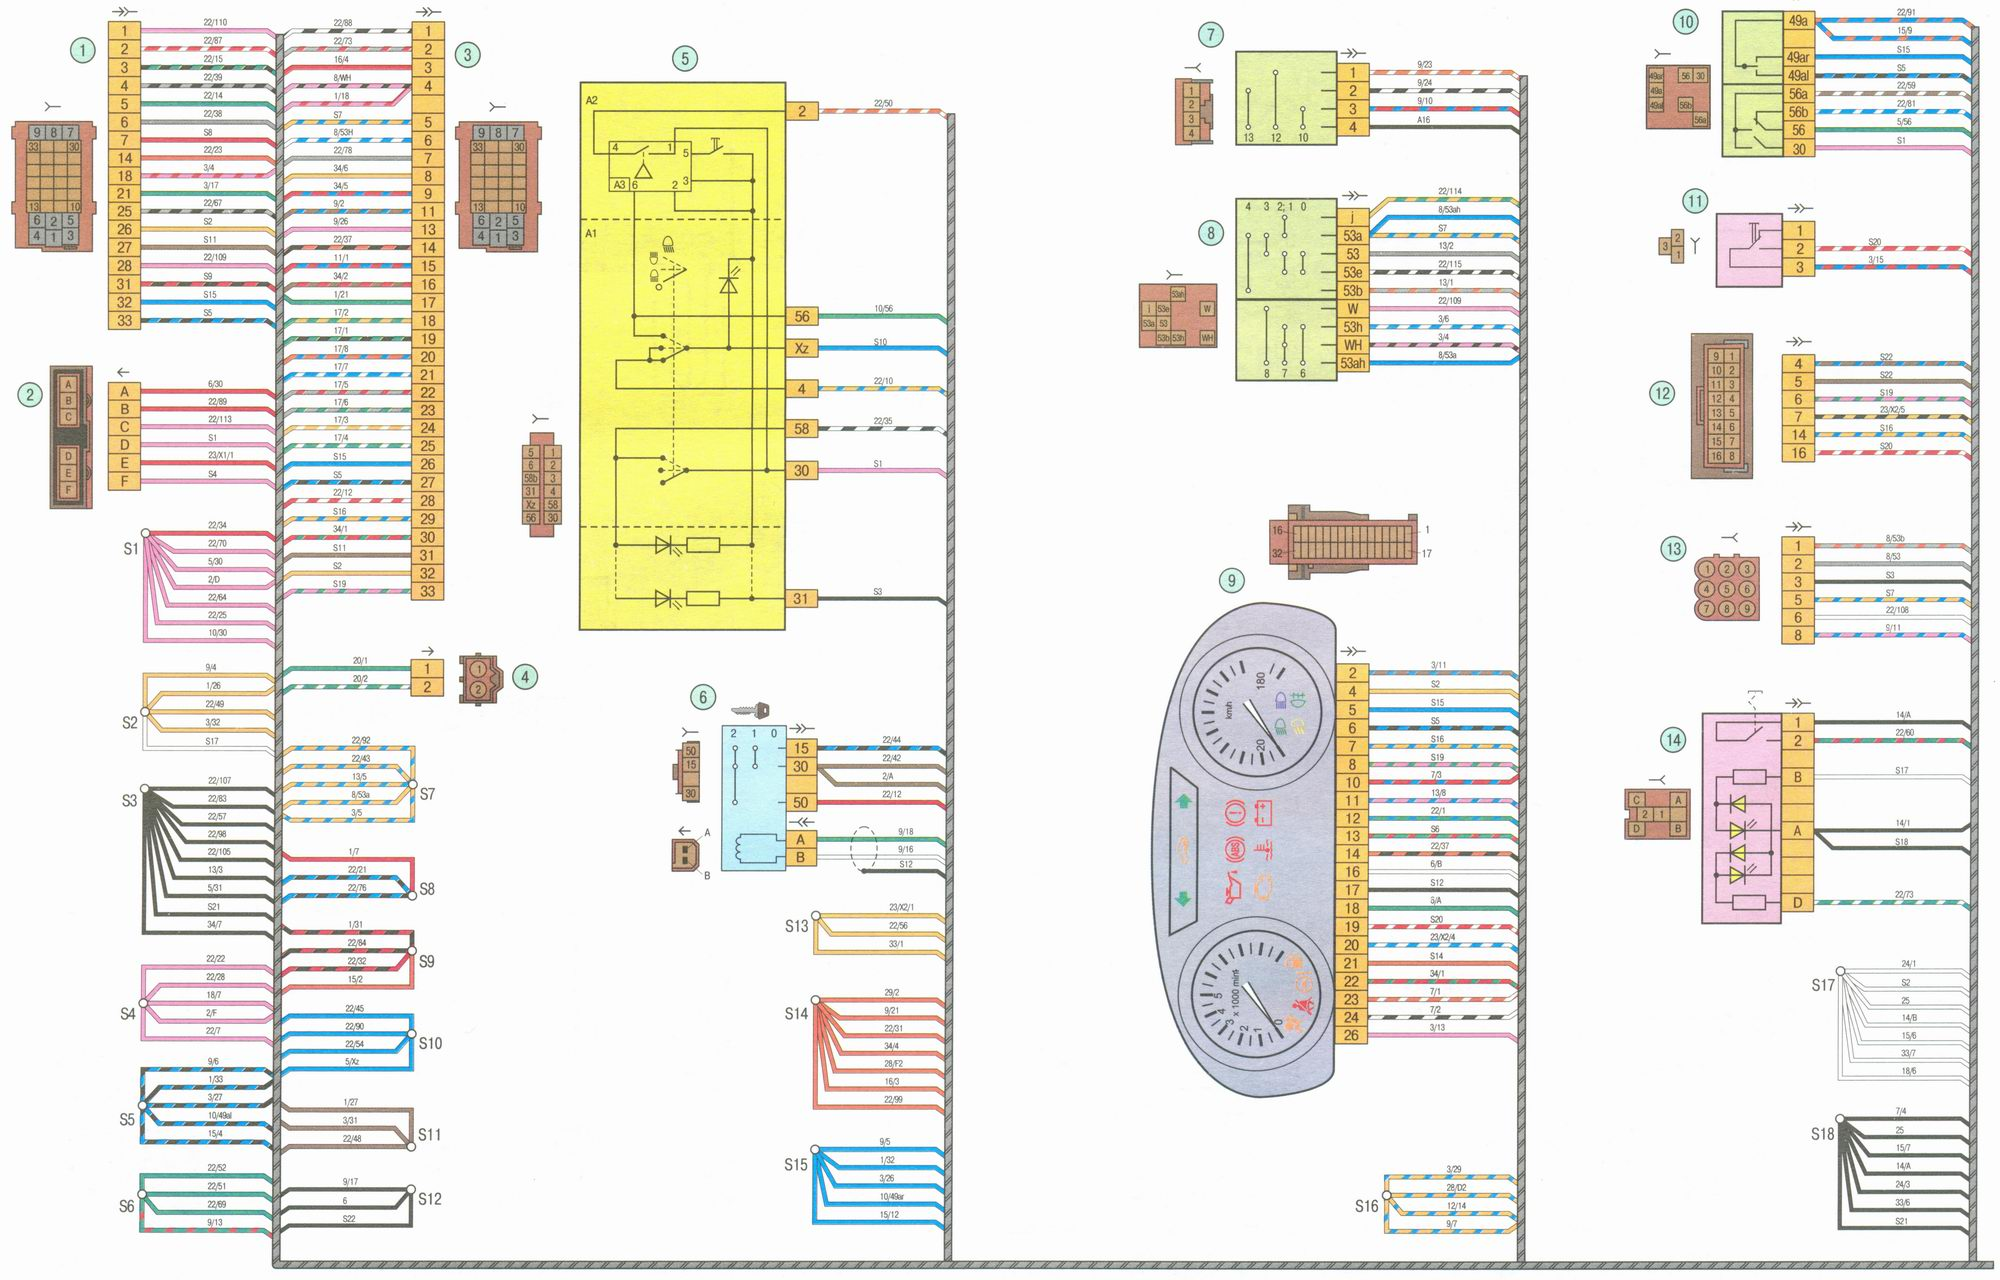 эл. схема комбинации приборов газ 2410